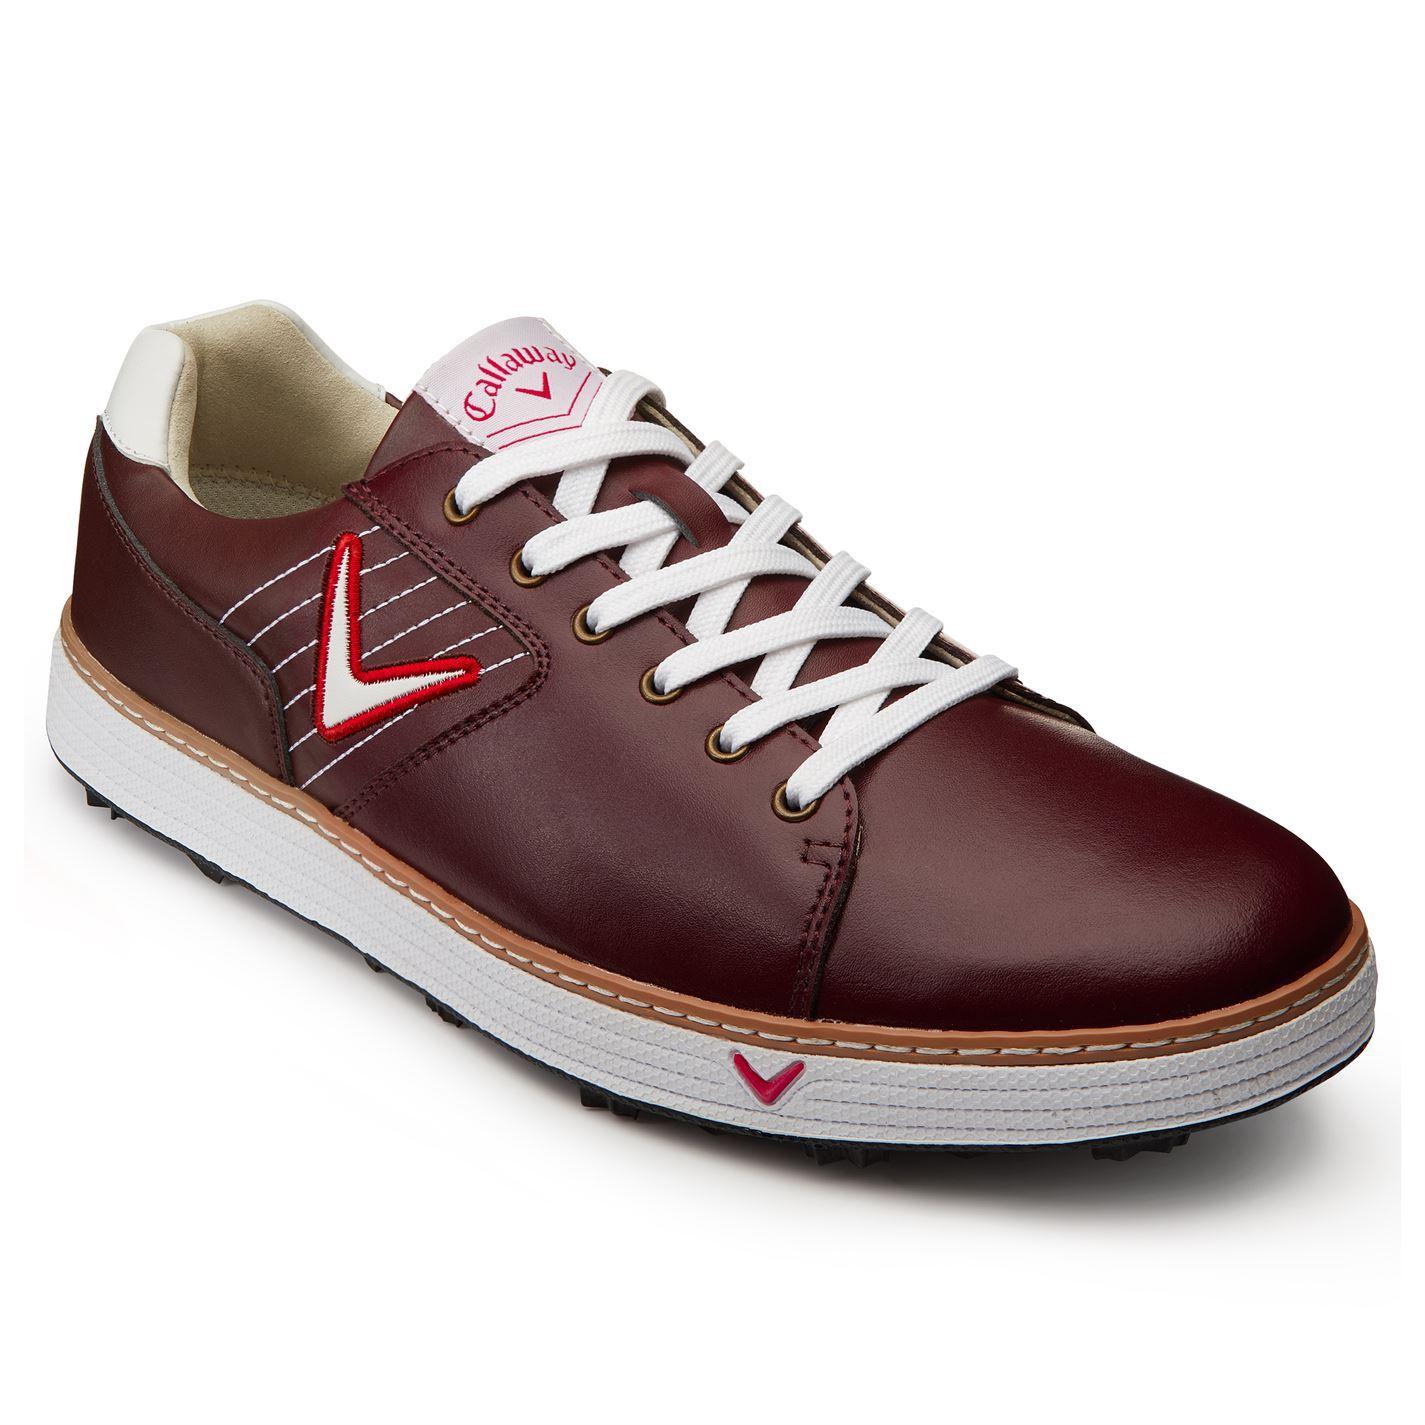 Callaway-Delmar-Urban-Golf-Shoes-Mens-Spikeless-Footwear thumbnail 6